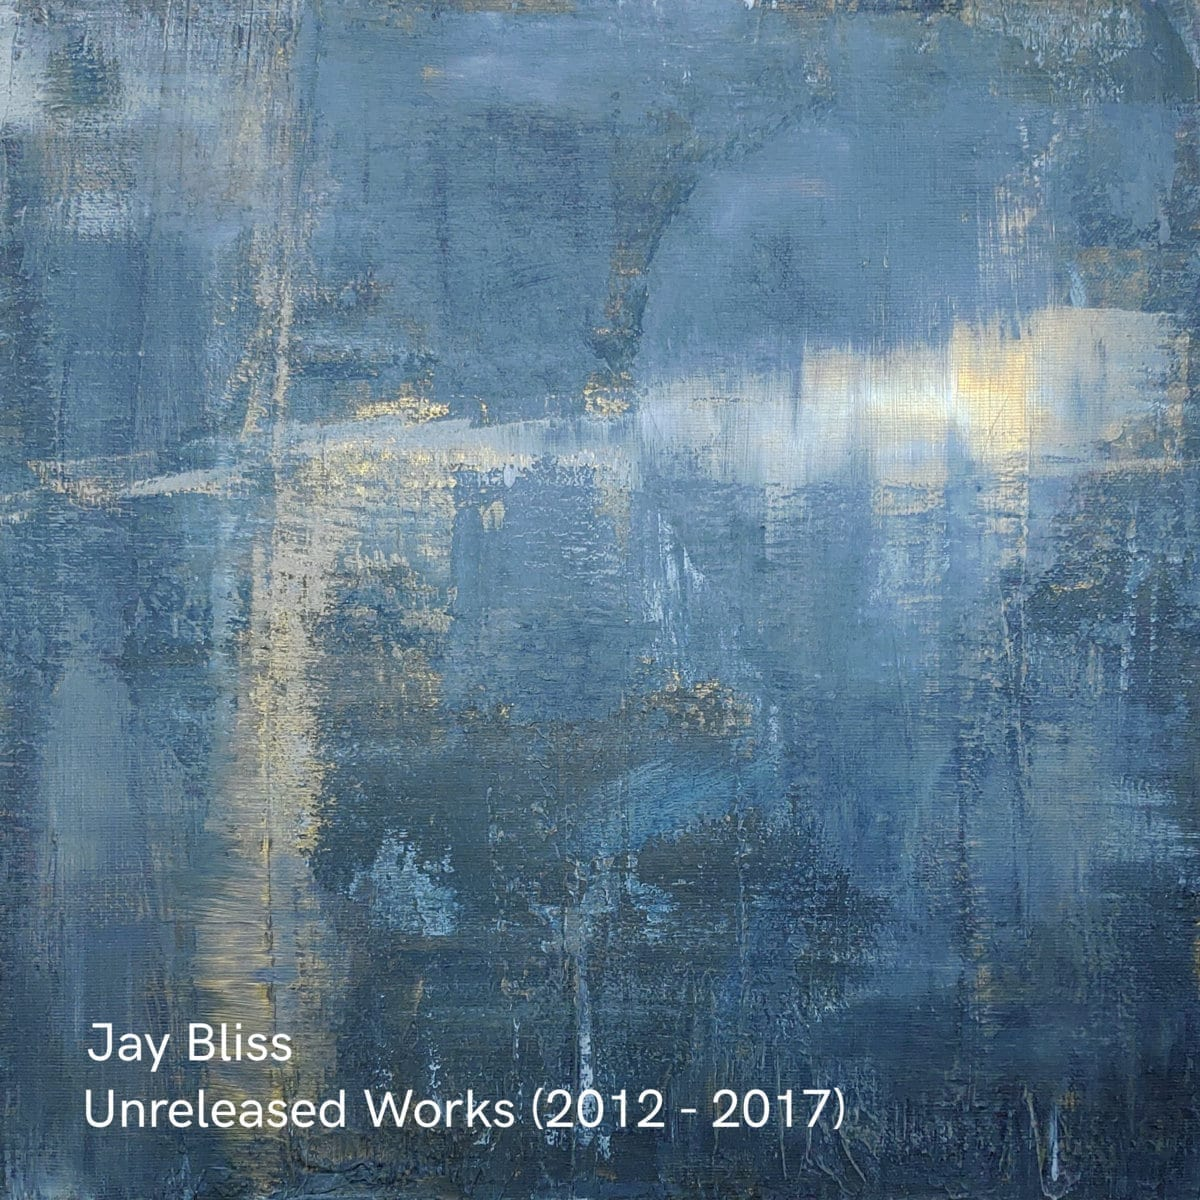 Jay Bliss - Unreleased Works (2012 - 2017)